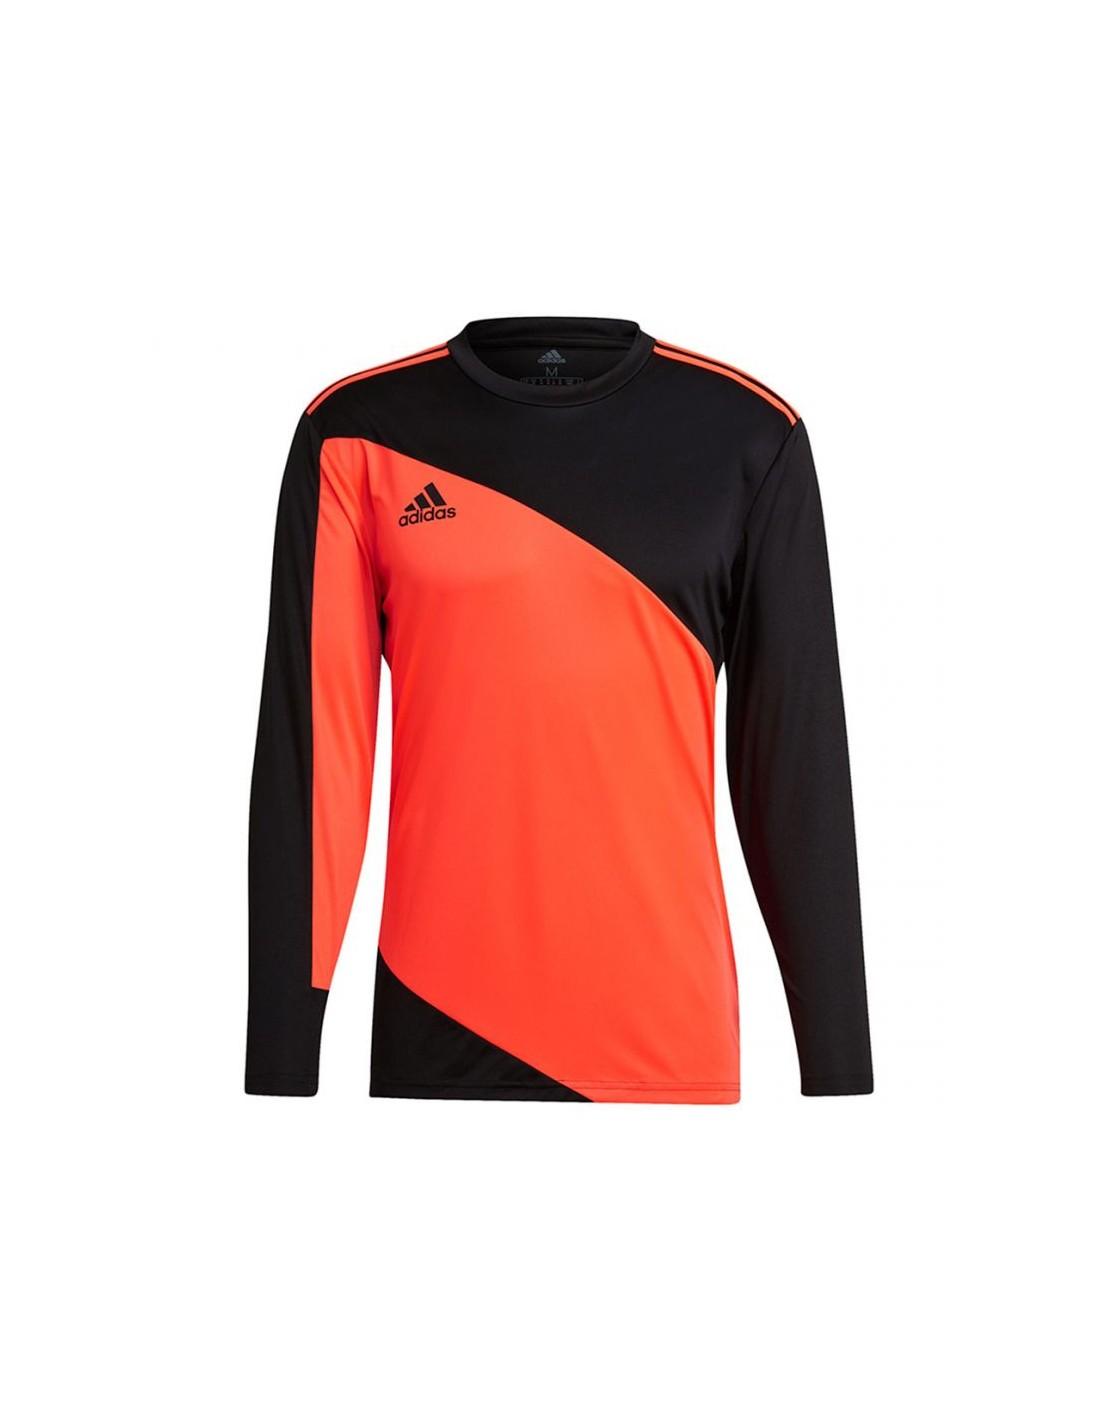 Goalkeeper jersey adidas Squadra 21 Goalkeeper Jersey M GK9805